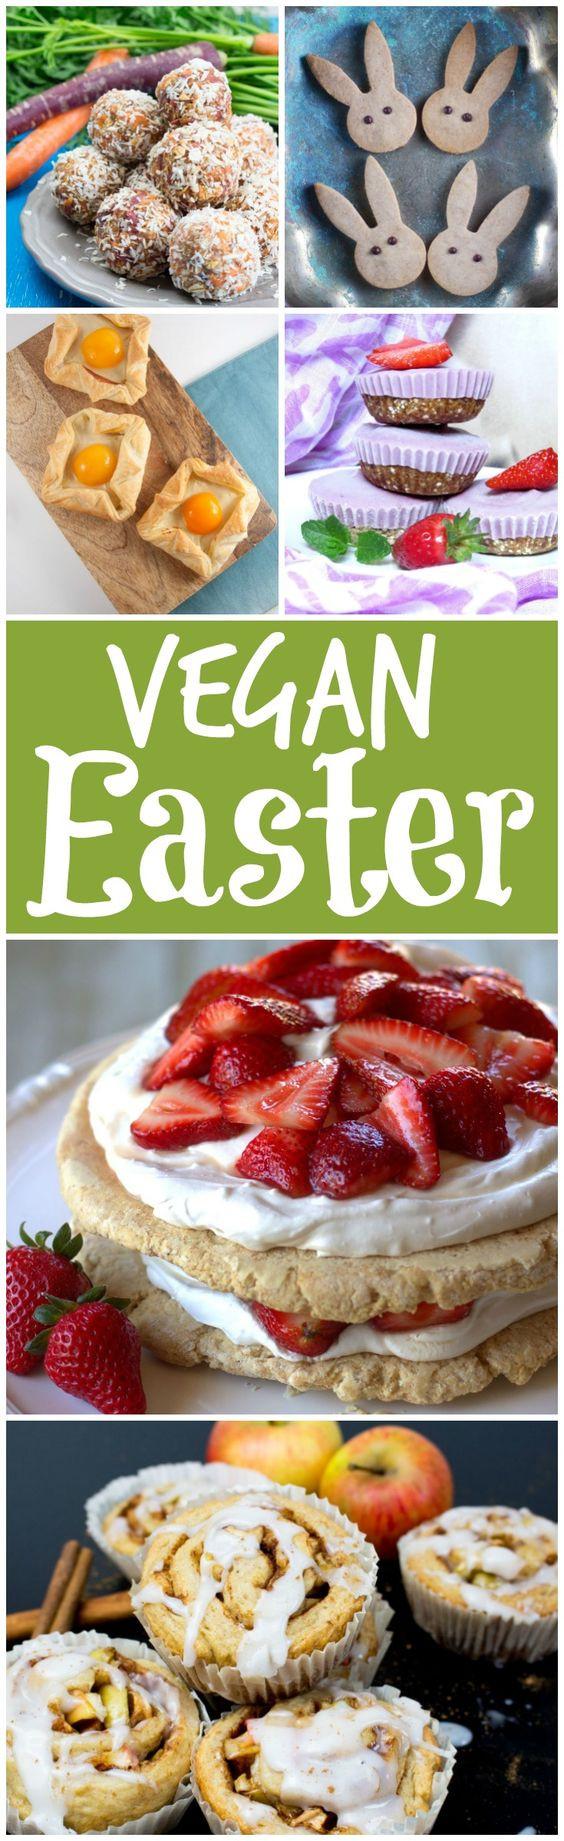 Vegan Easter Desserts 15 Delicious Vegan Easter Recipes